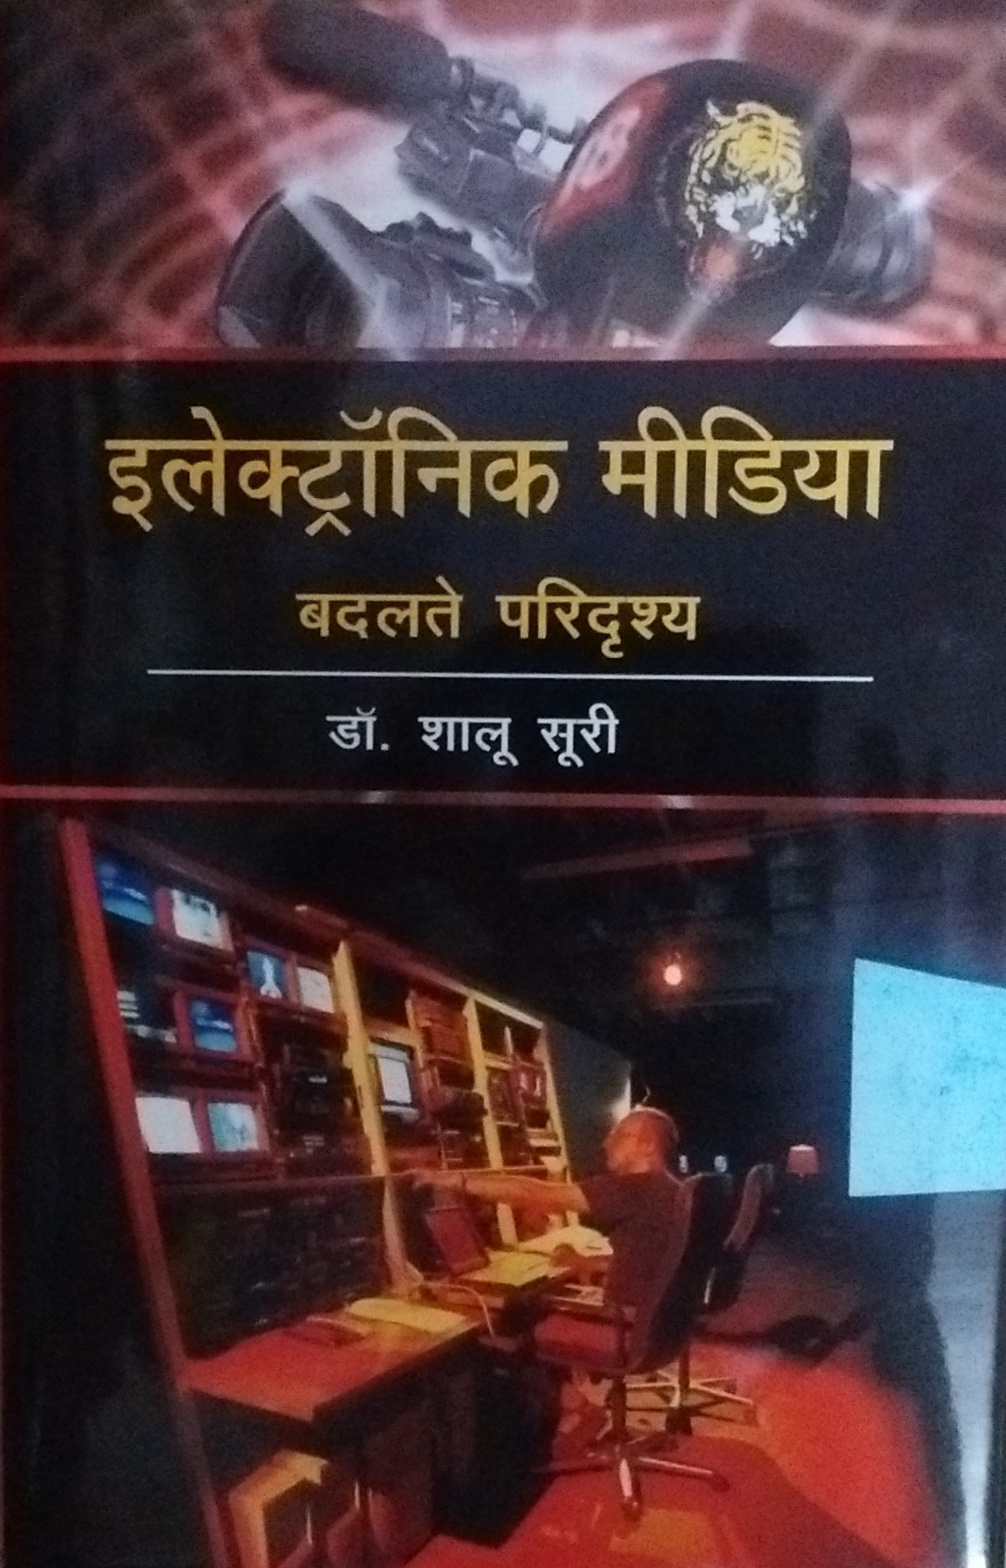 Electronic Media: Badalte Paridrishya (Hindi)